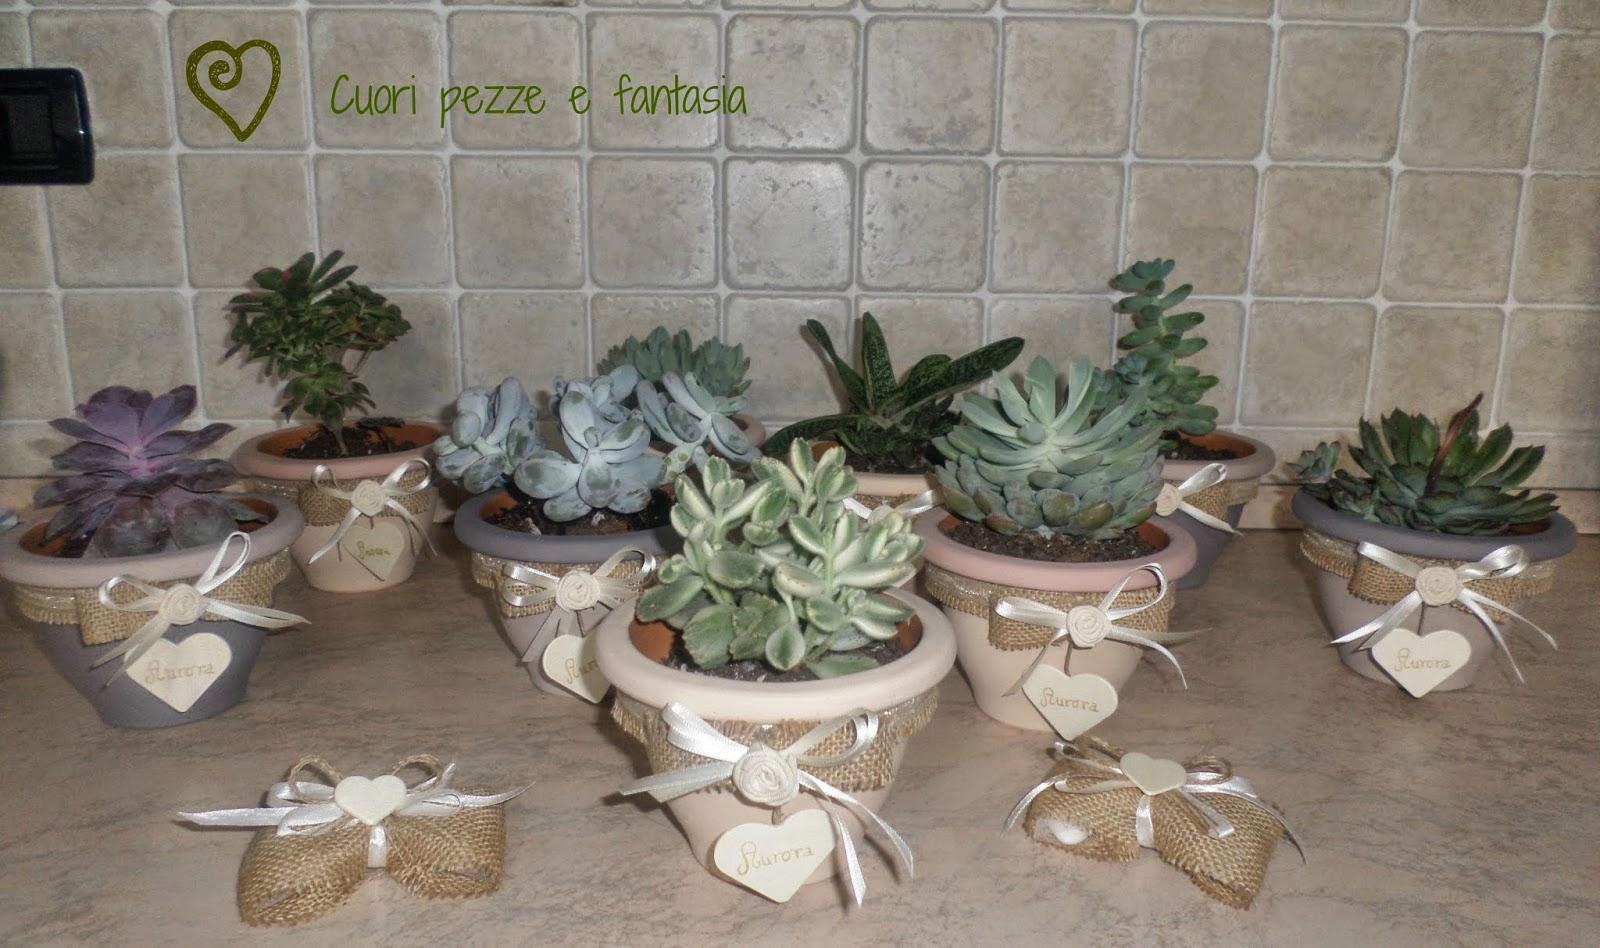 Vasi in terracotta dipinti in varie tonalità e piantina grassa